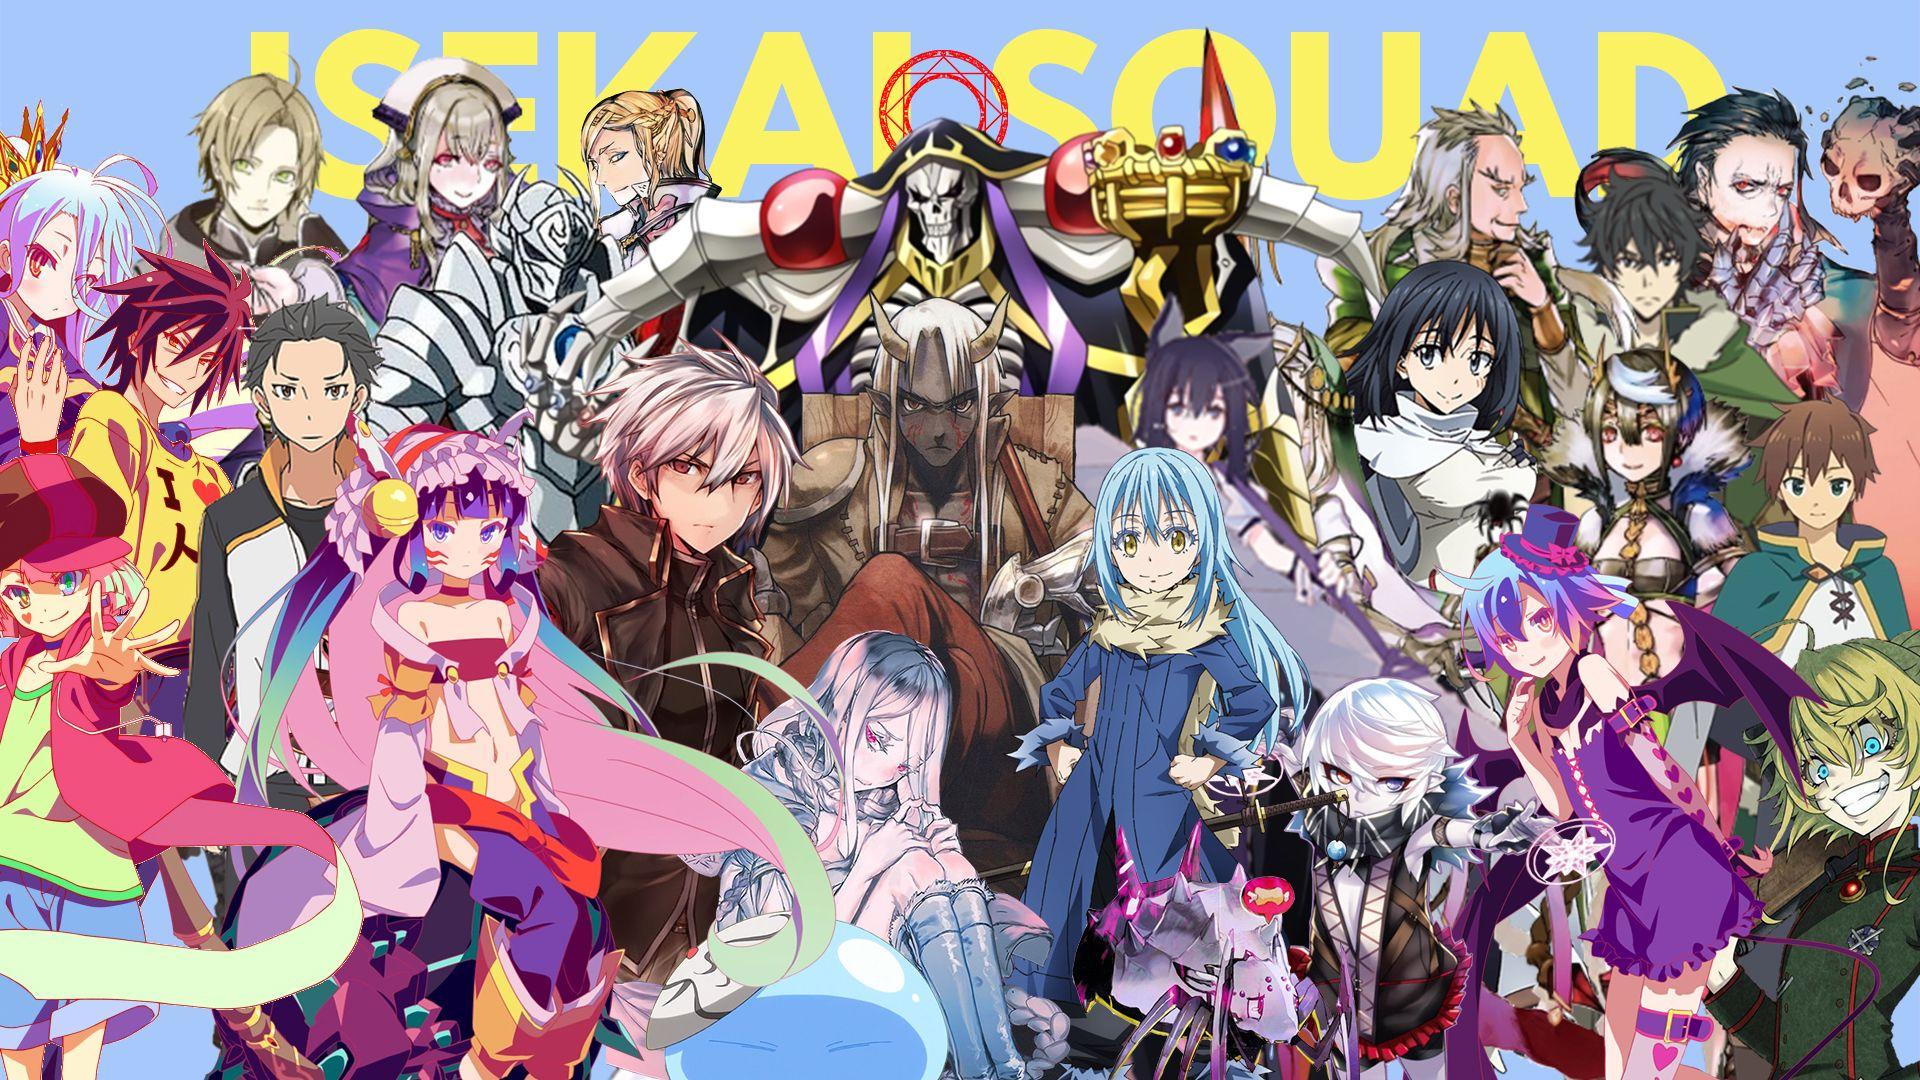 Isekai Anime With Op Mc 2020 in 2020 Anime, Best anime